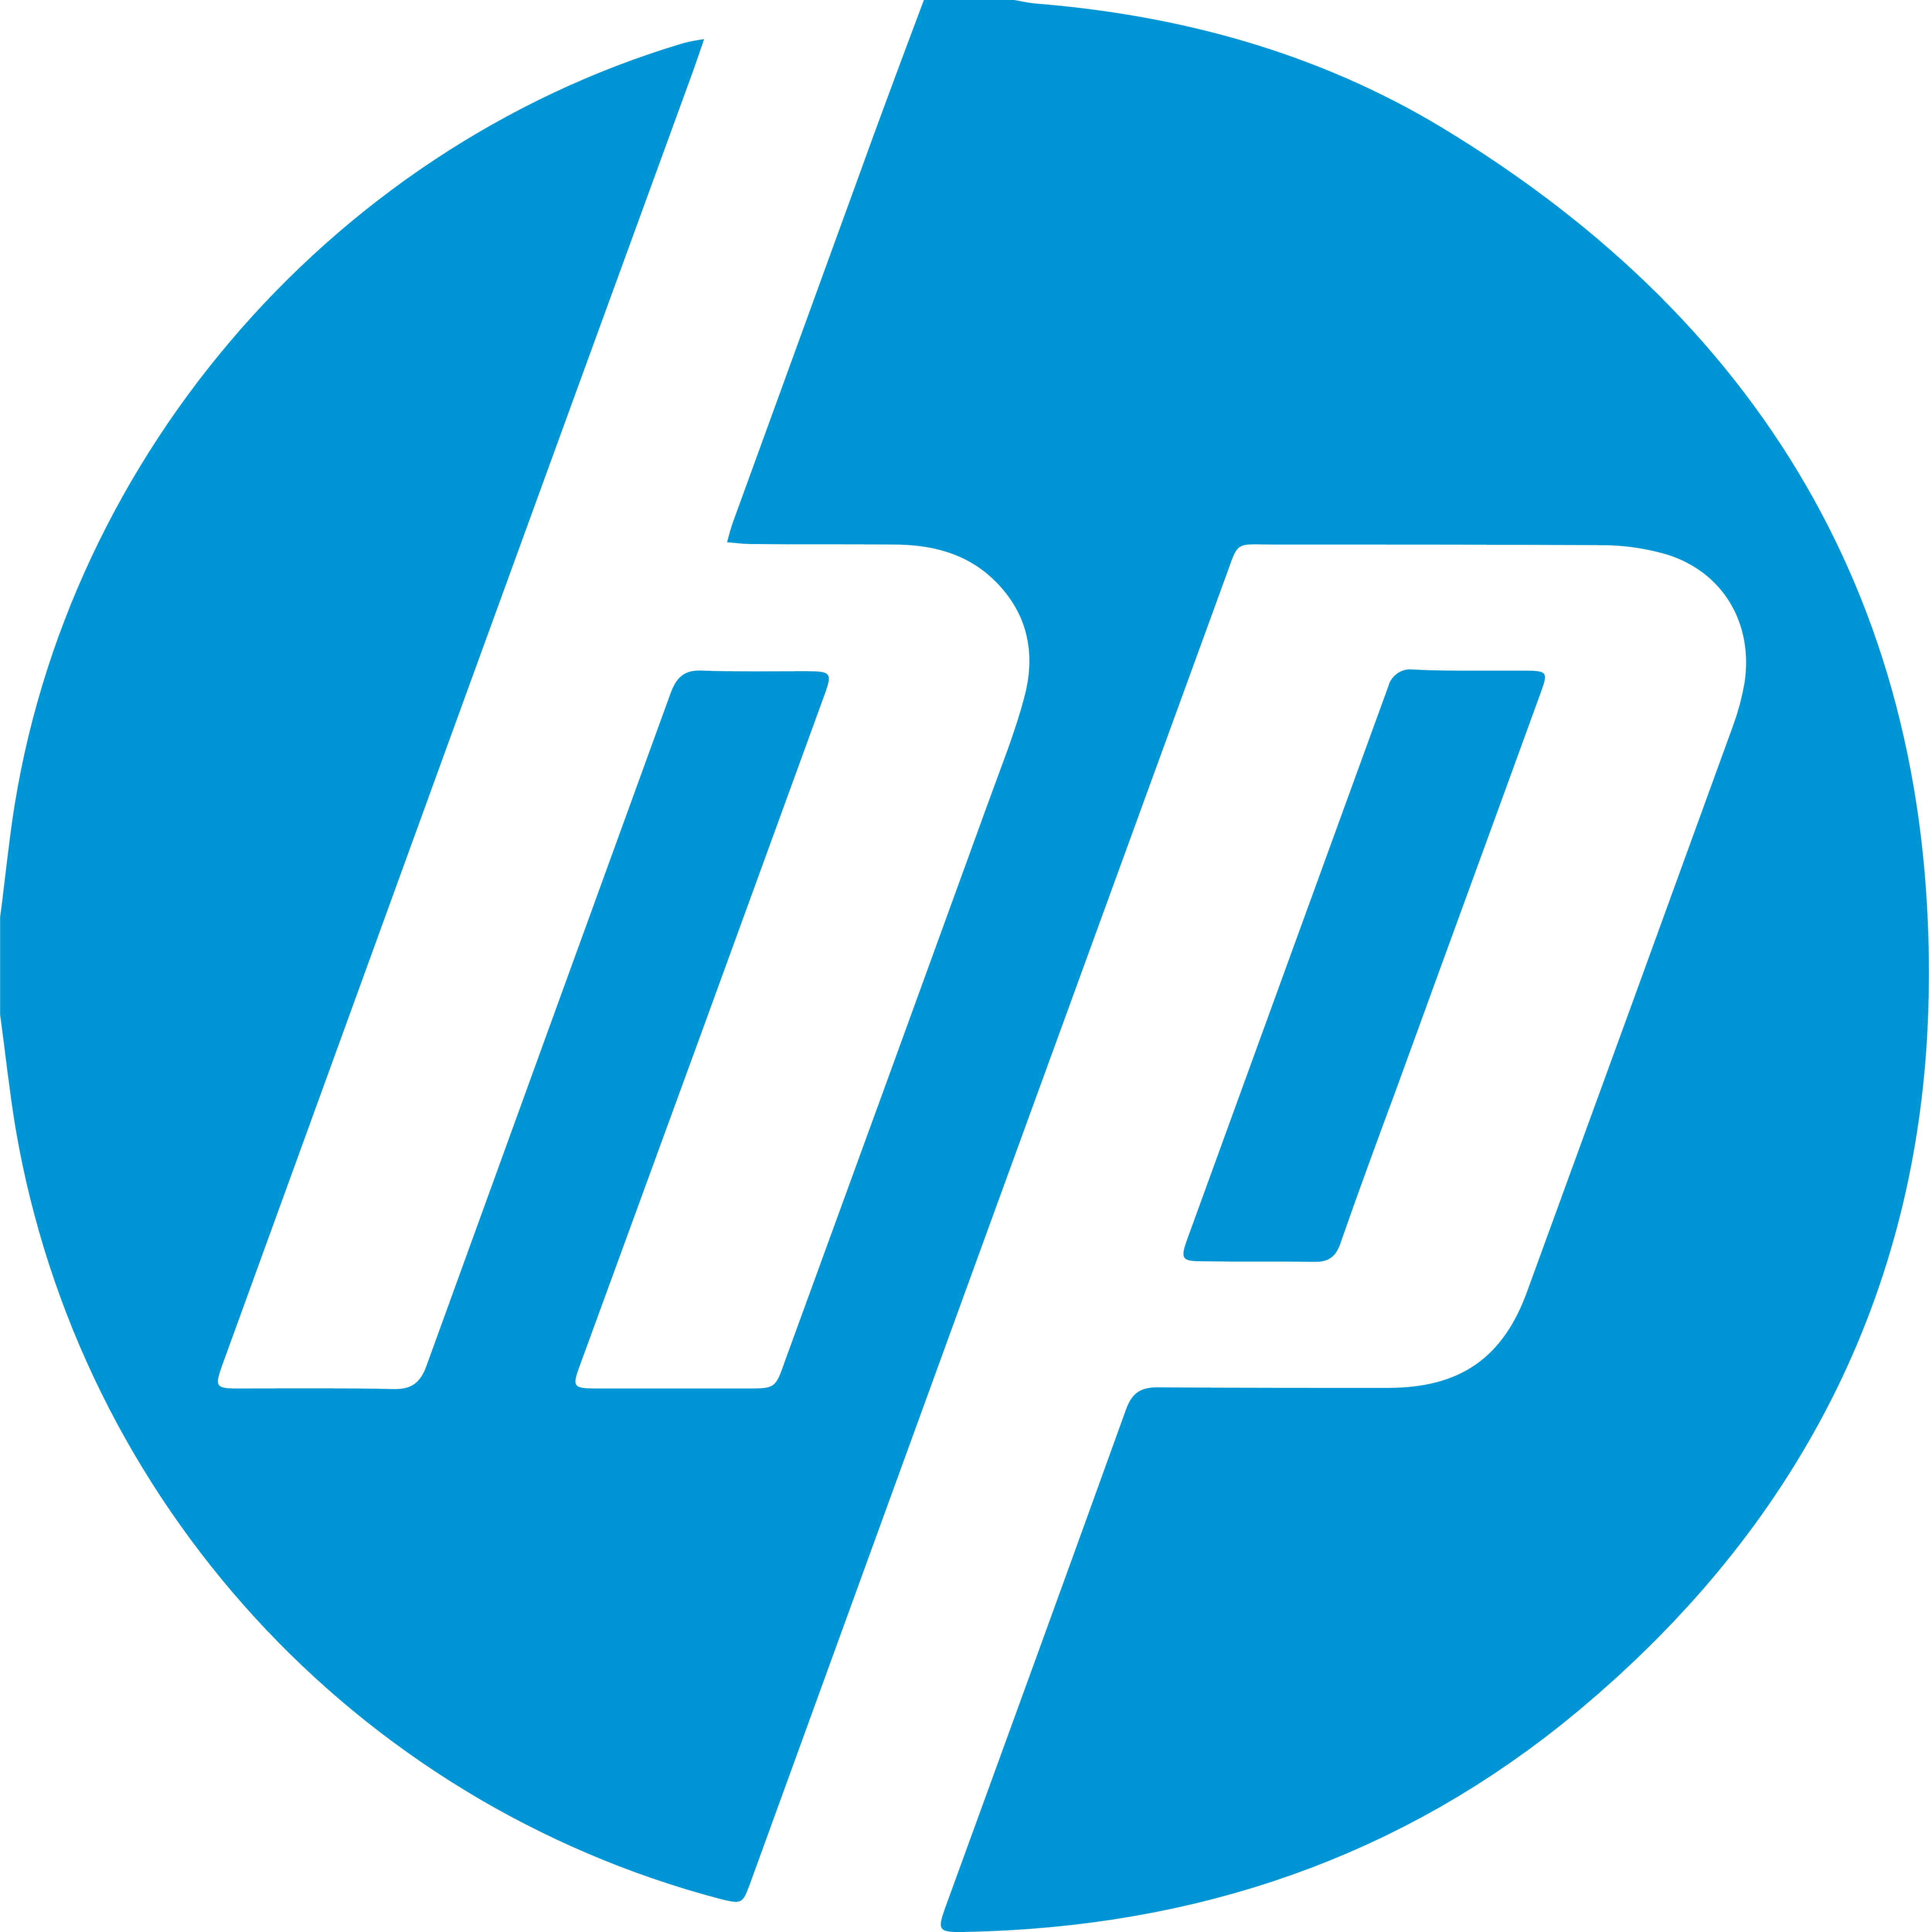 hp  hewlett packard logos download logo maker houston logo maker png